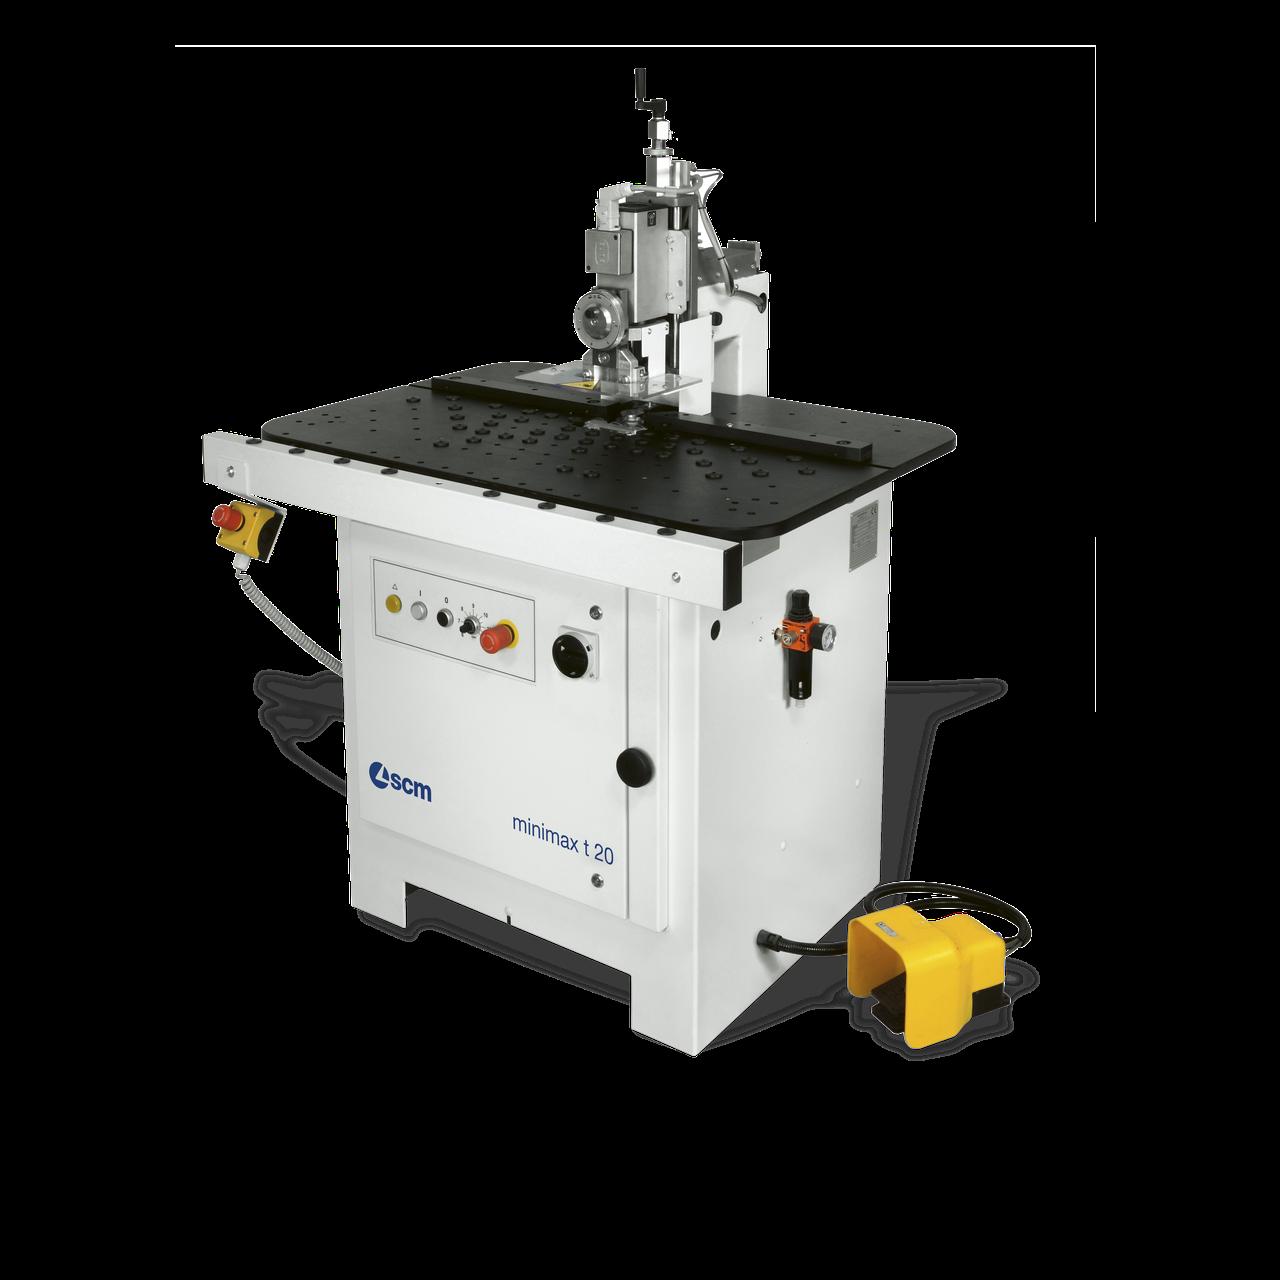 Кромкофрезерный станок minimax t 20 (SCM Group)